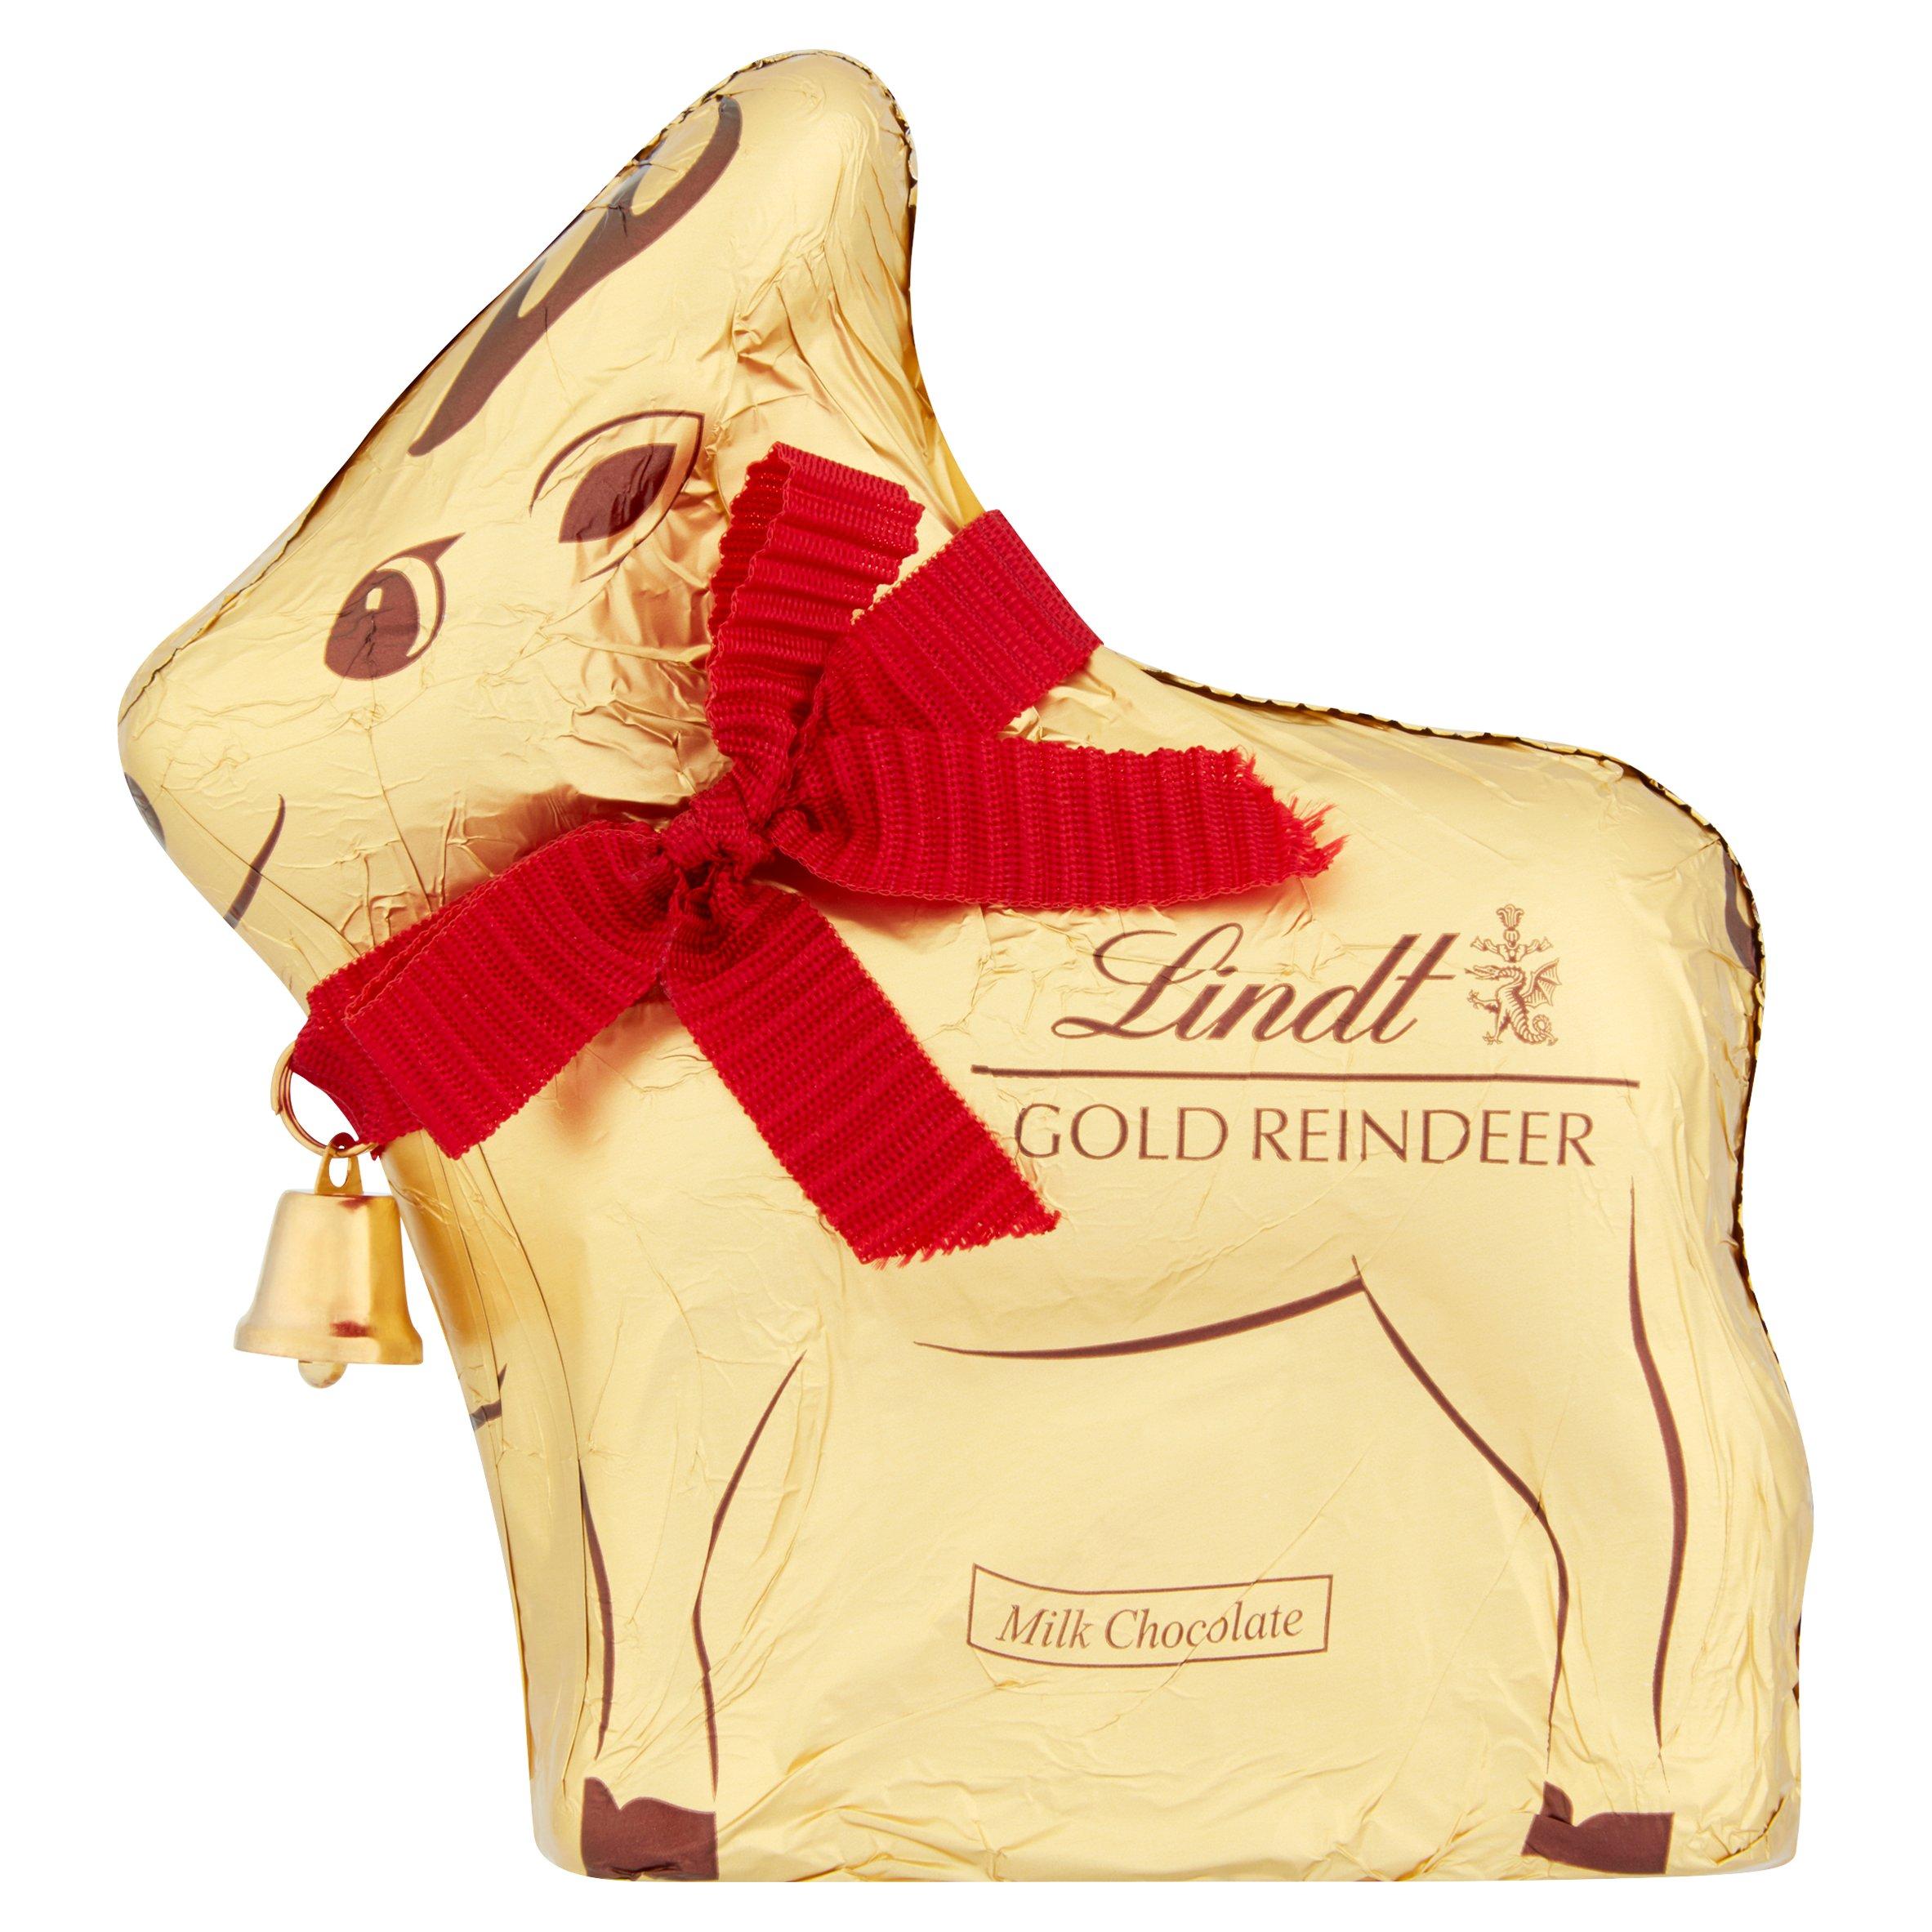 Lindt Chocolate Reindeer 100G